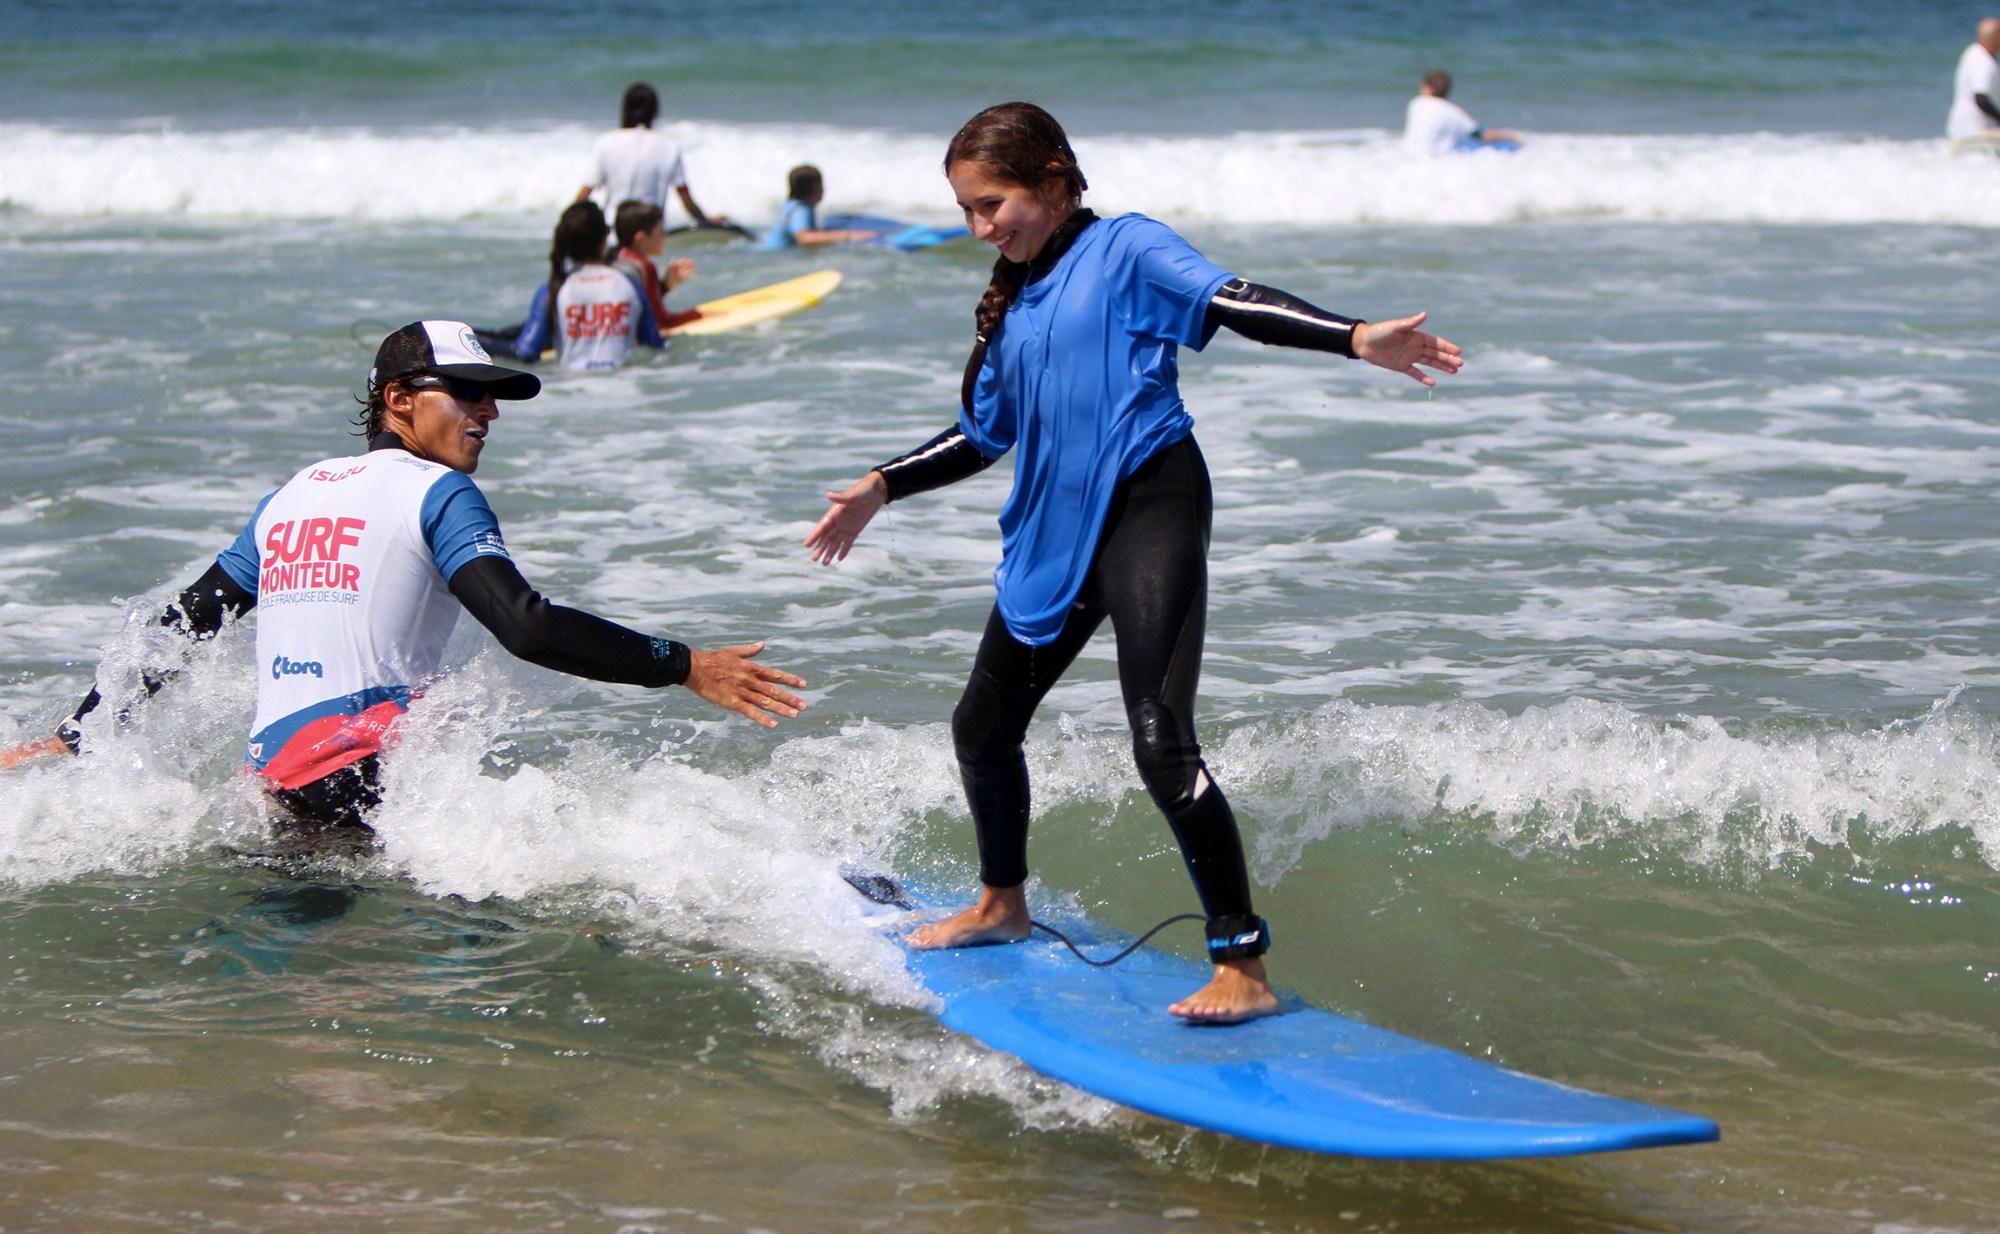 Ecole de surf Labenne, Sharkpool